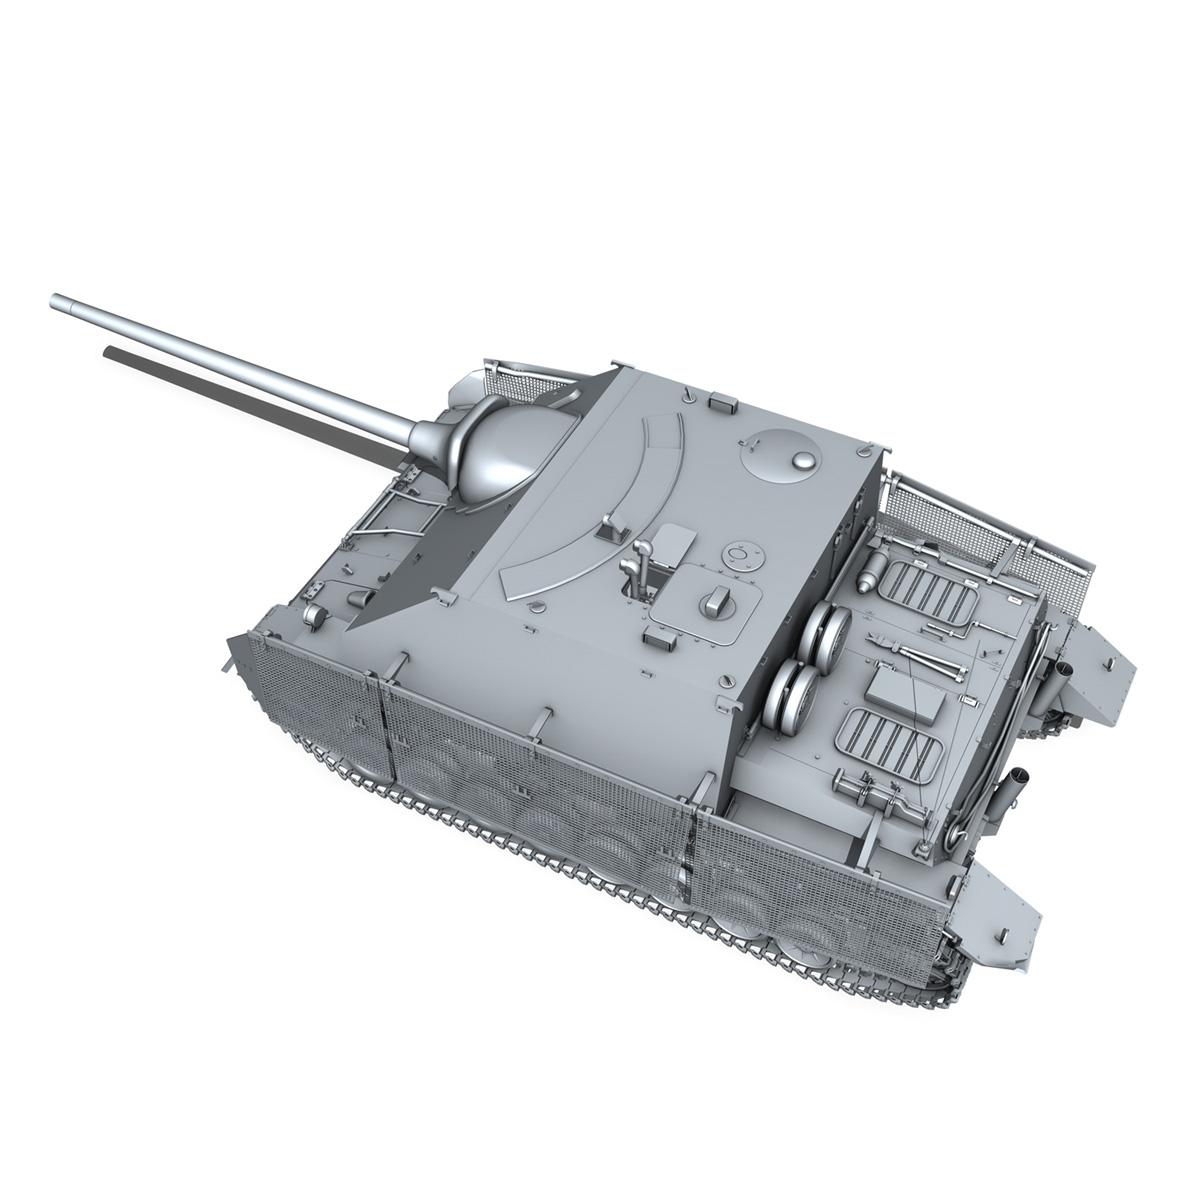 jagdpanzer iv l/70 (a) – sd.kfz 162/1 3d model 3ds fbx c4d lwo obj 202009